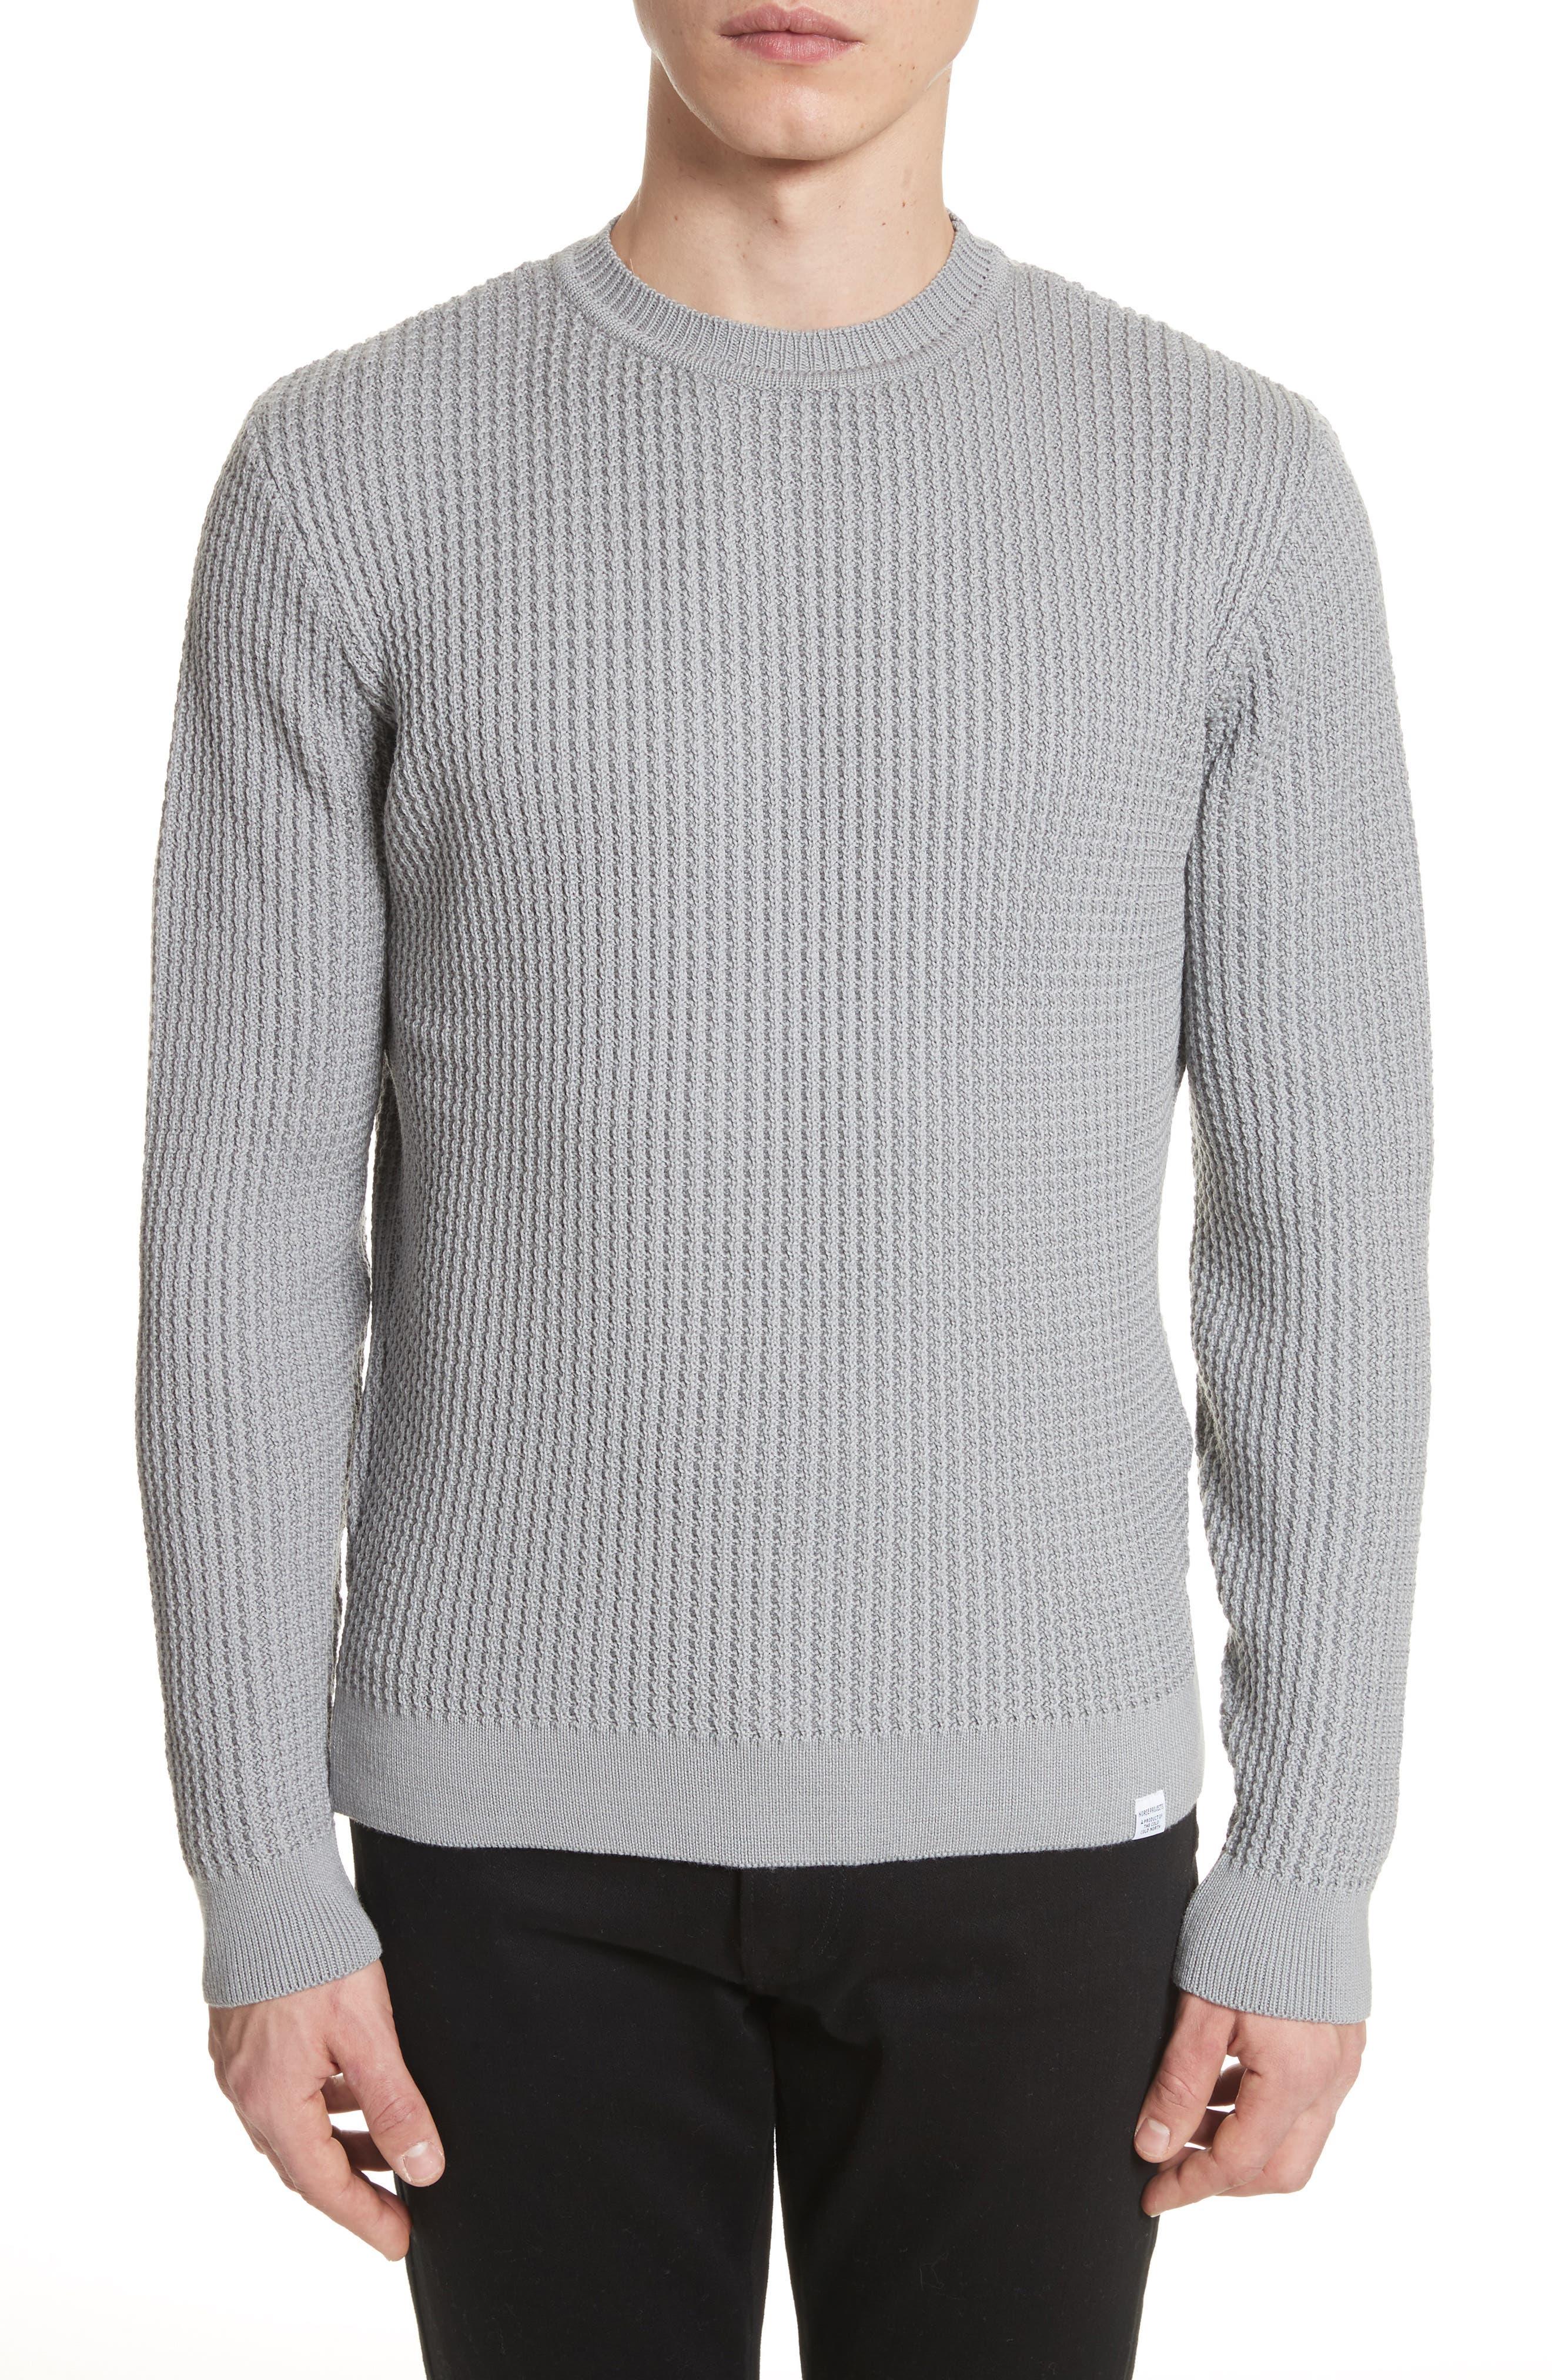 Sigfred Merino Wool Sweater,                             Main thumbnail 1, color,                             025